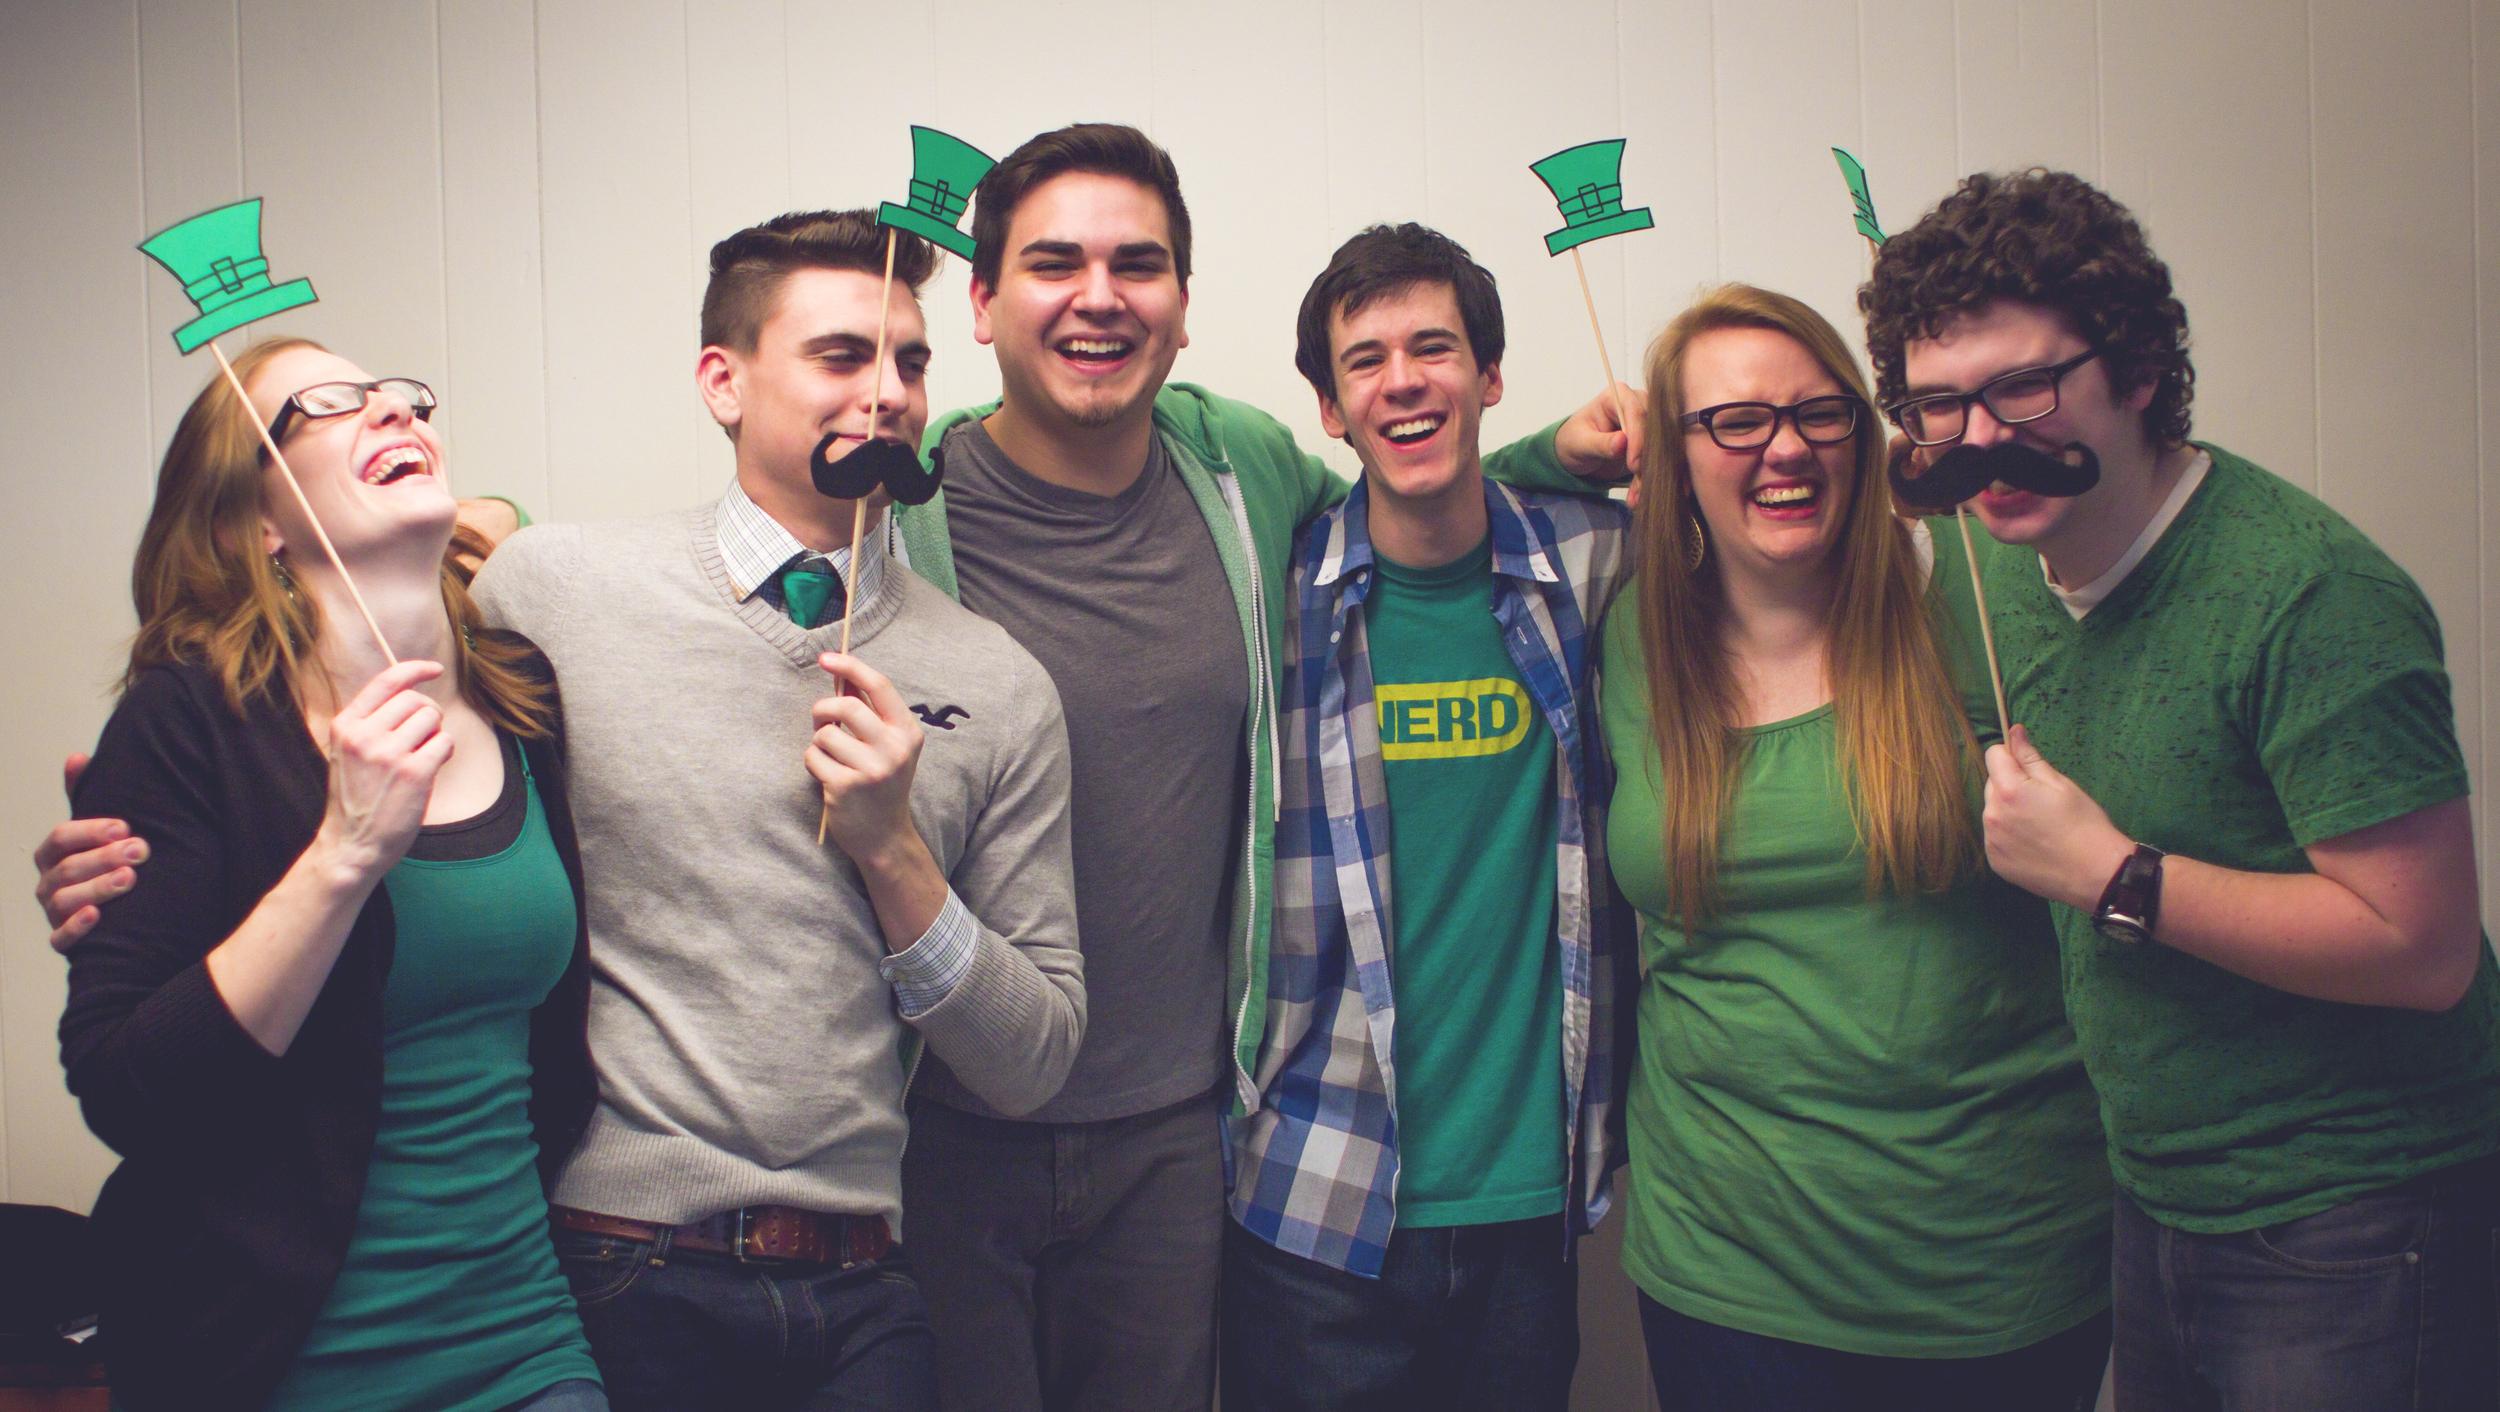 St. Patricks Day - we LOVE green